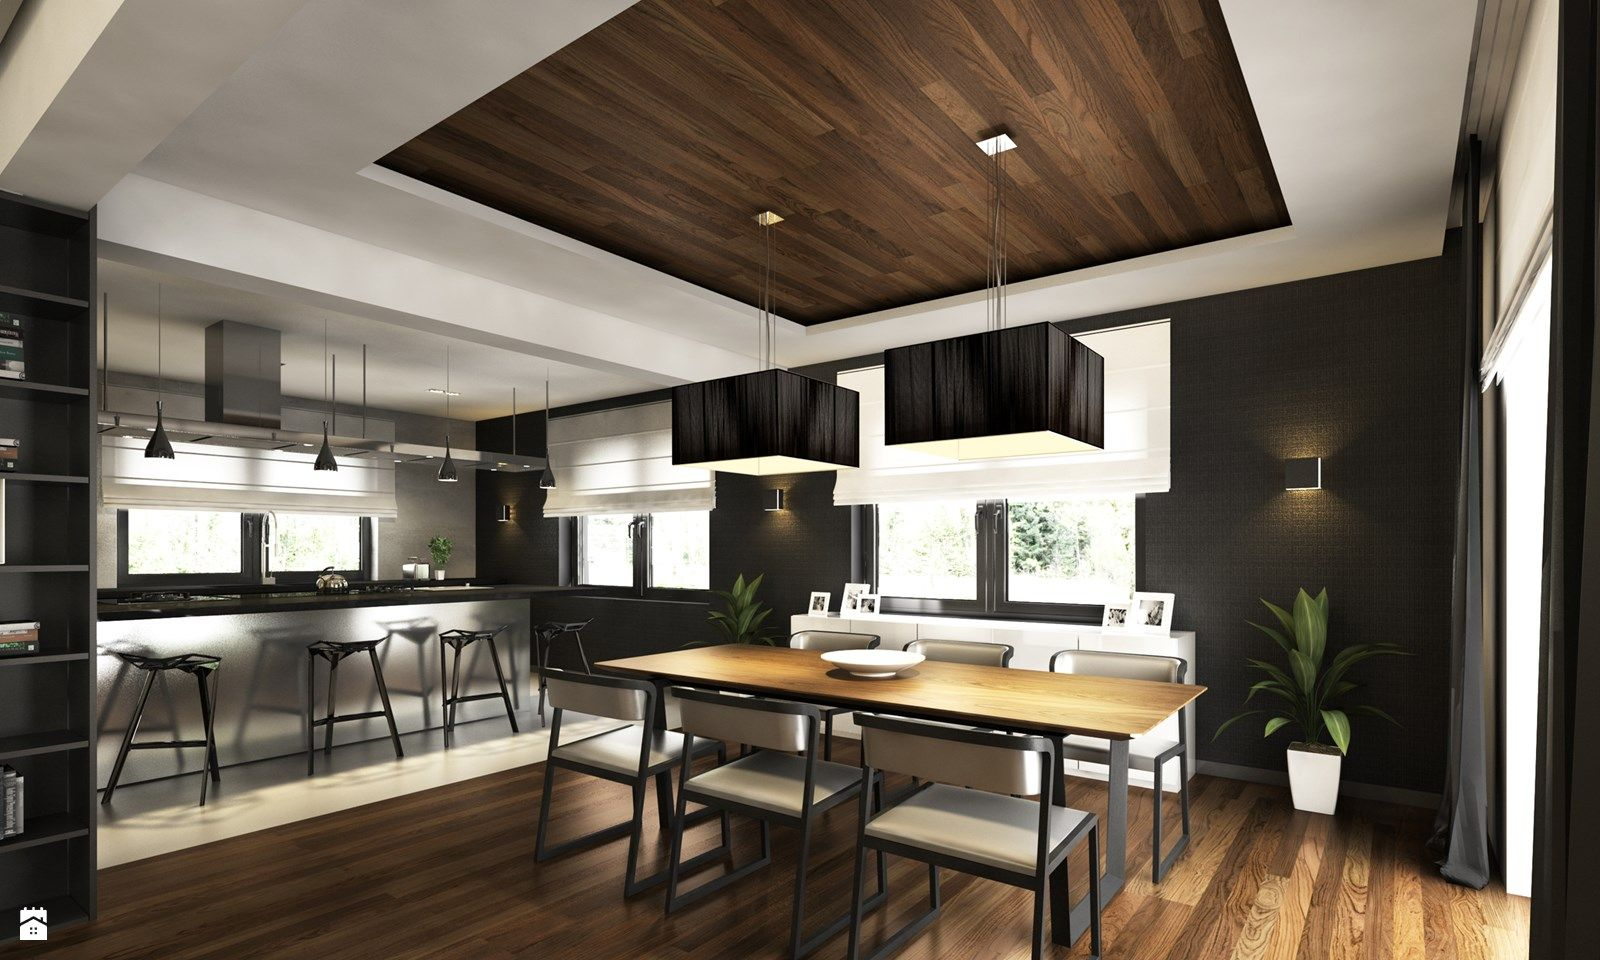 Zdjecie Jadalnia Styl Nowoczesny Home Decor Home Interior